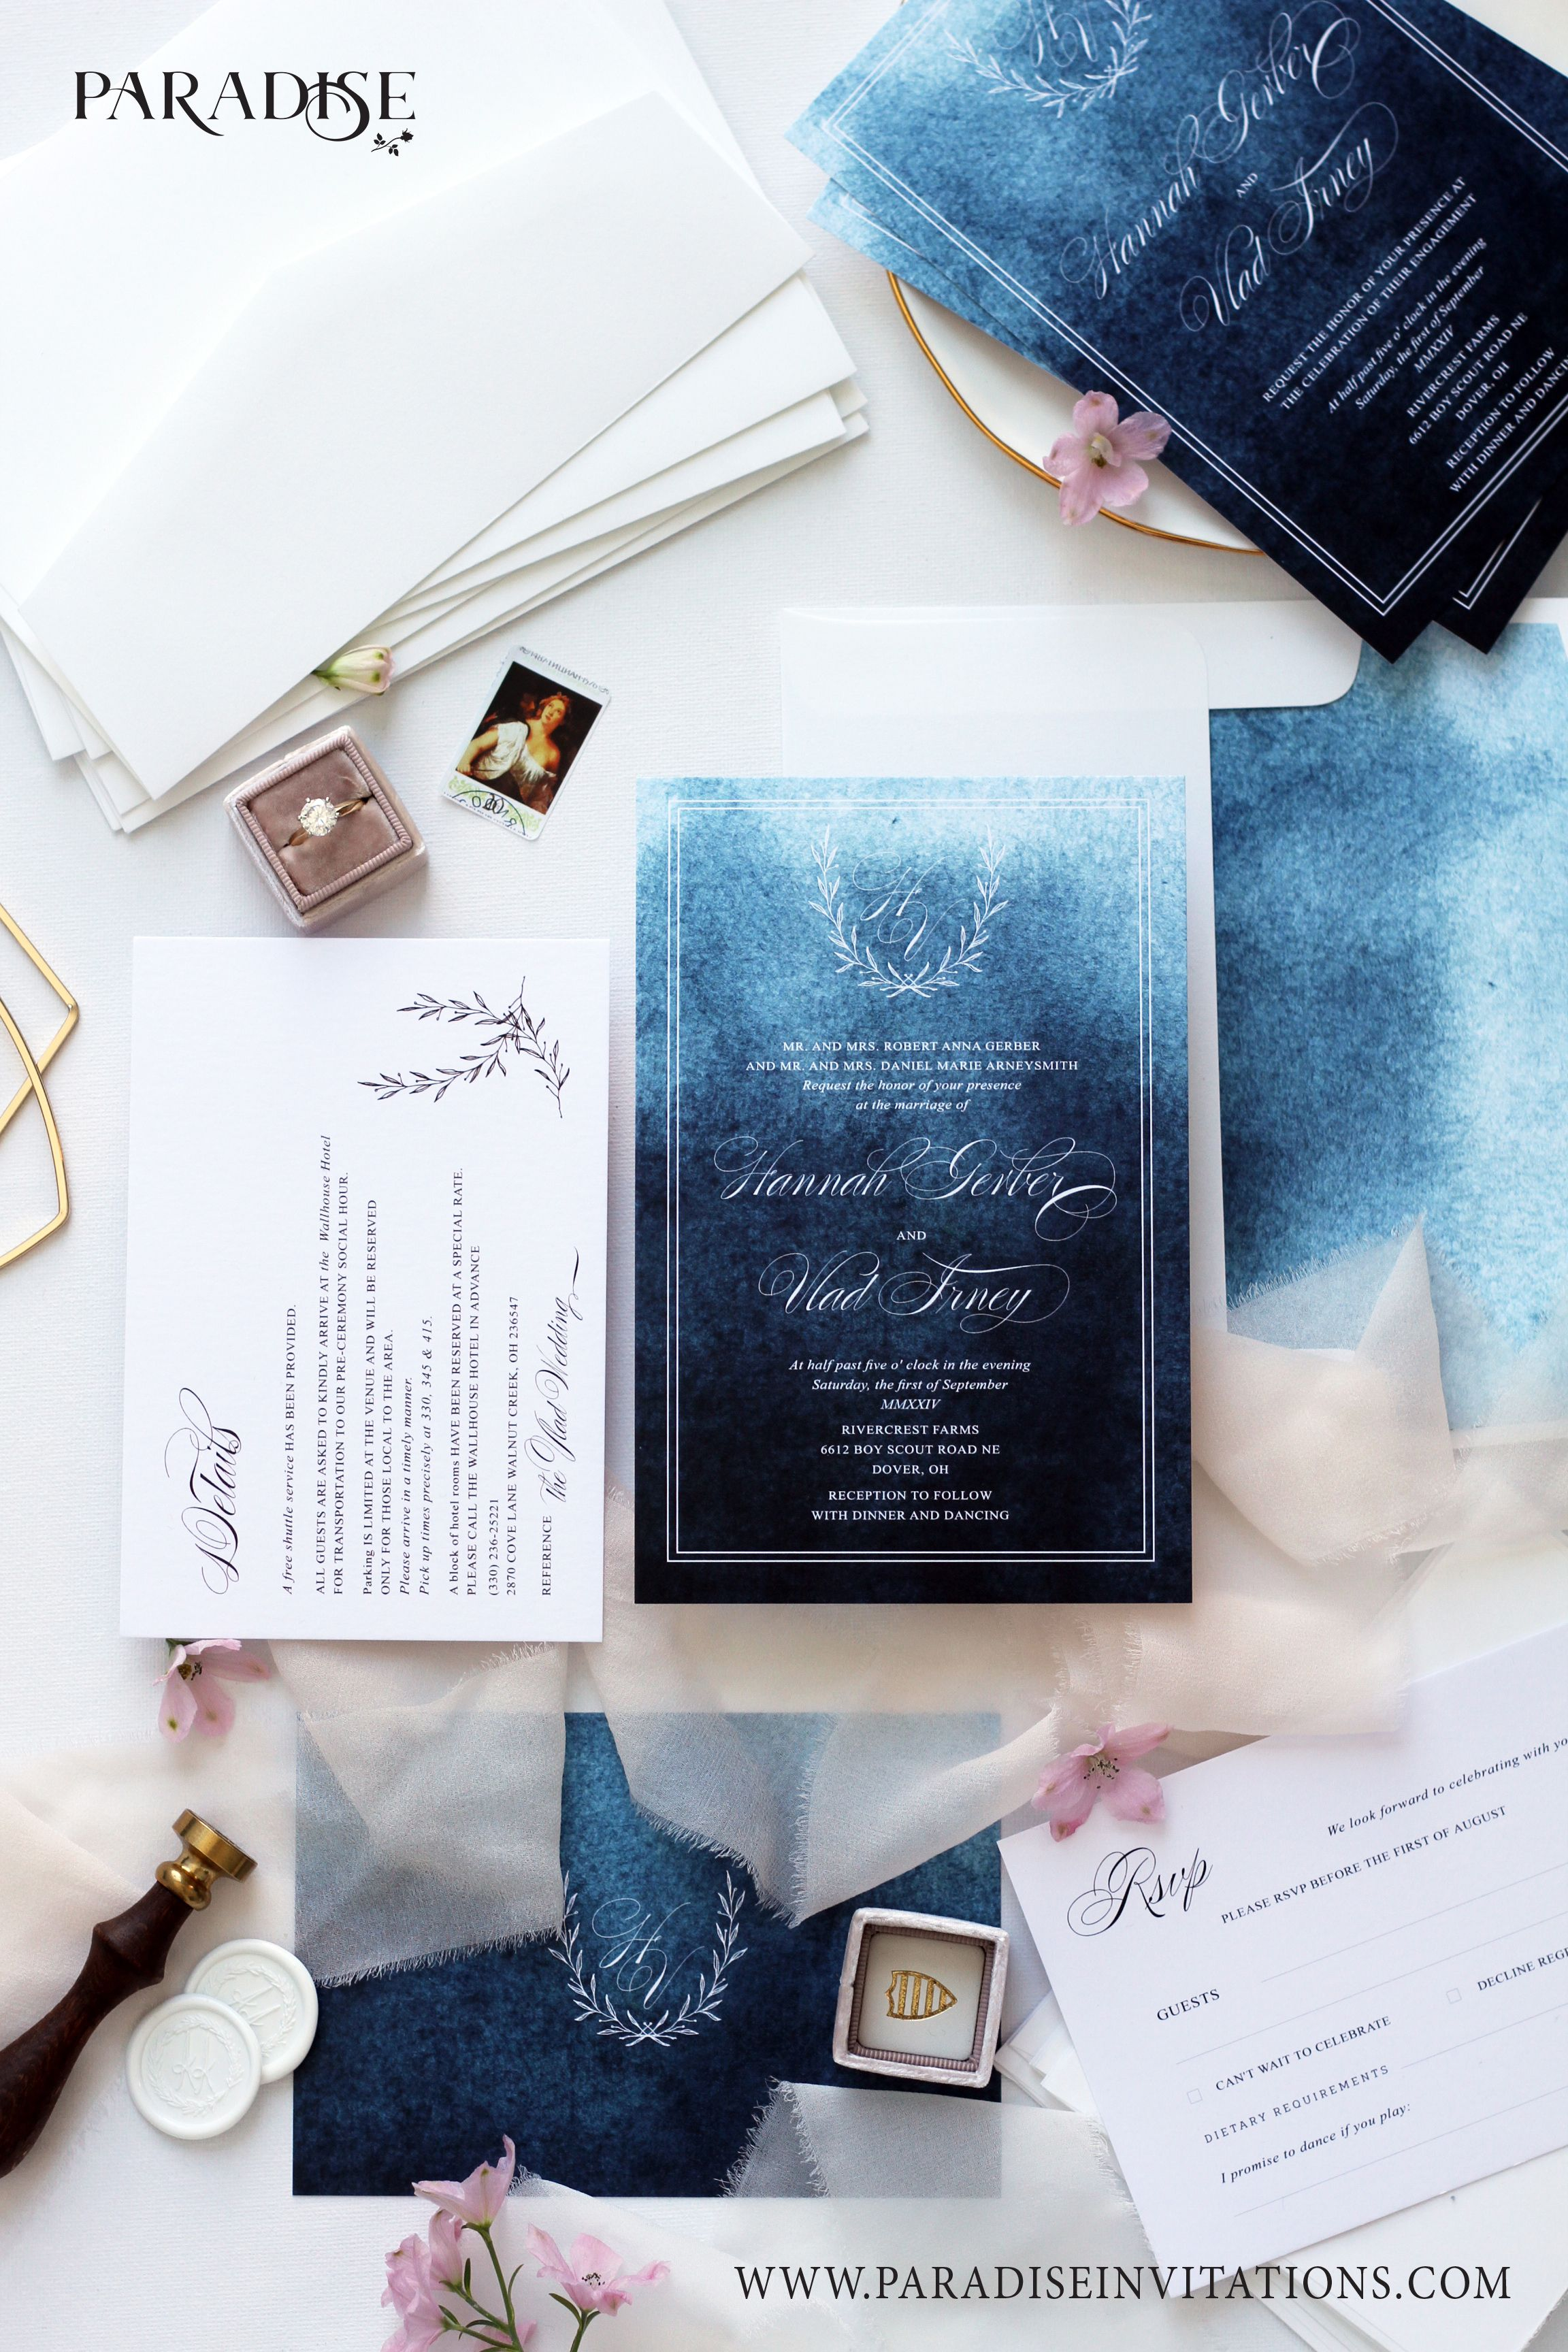 Navy Blue Watercolor Background Wedding Invitation Wedding Invitation Weddinginvitation Weddingst Contoh Undangan Pernikahan Undangan Pernikahan Pernikahan